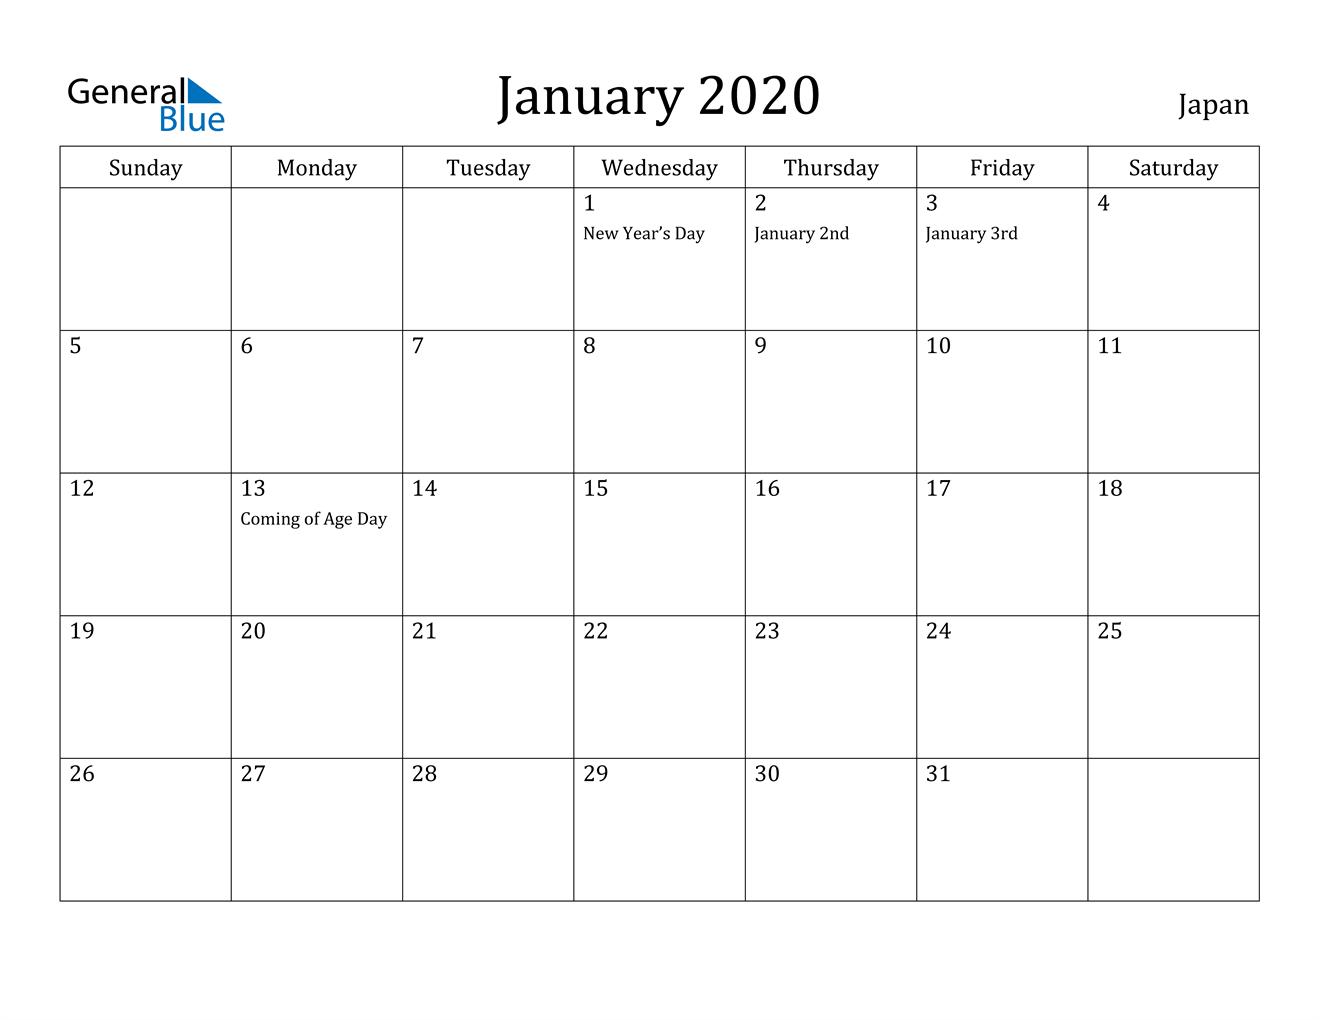 Image of January 2020 Japan Calendar with Holidays Calendar